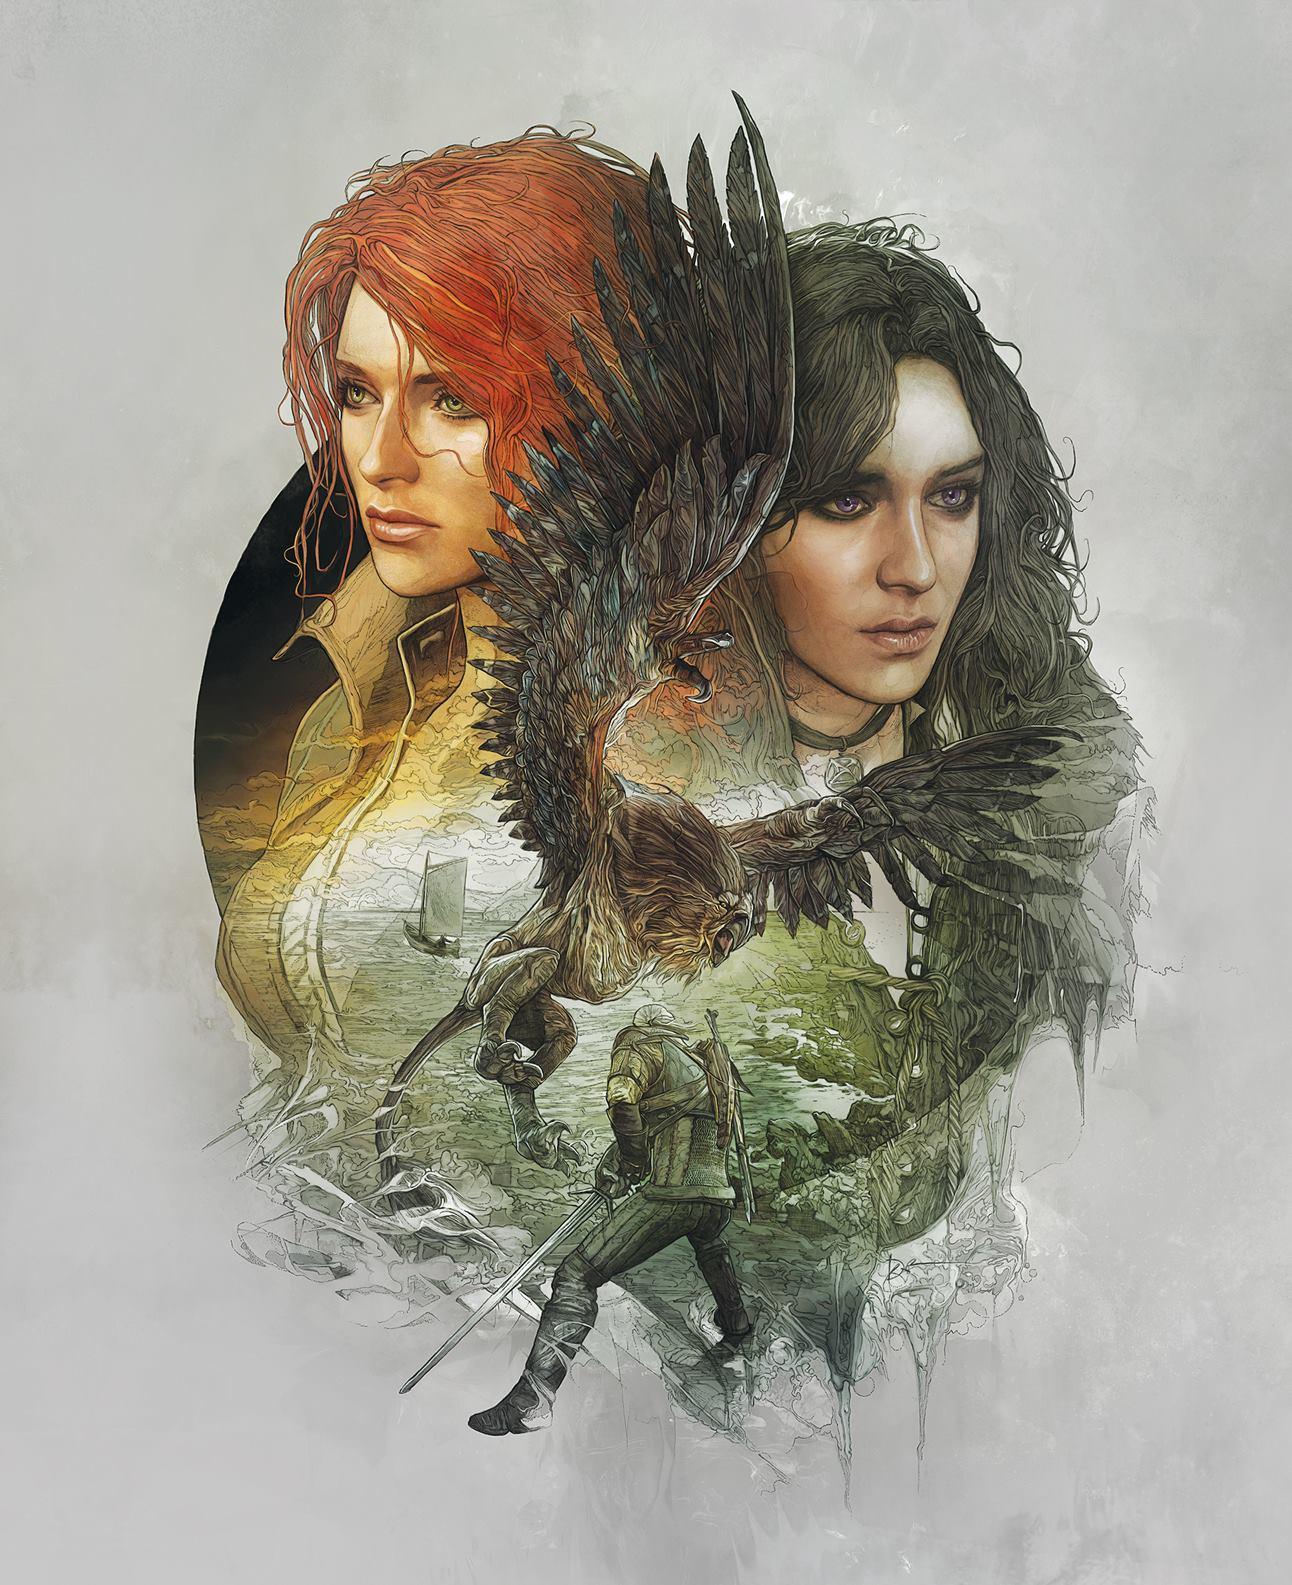 The Witcher 3 Wild Hunt Gets Stellar Character Artwork